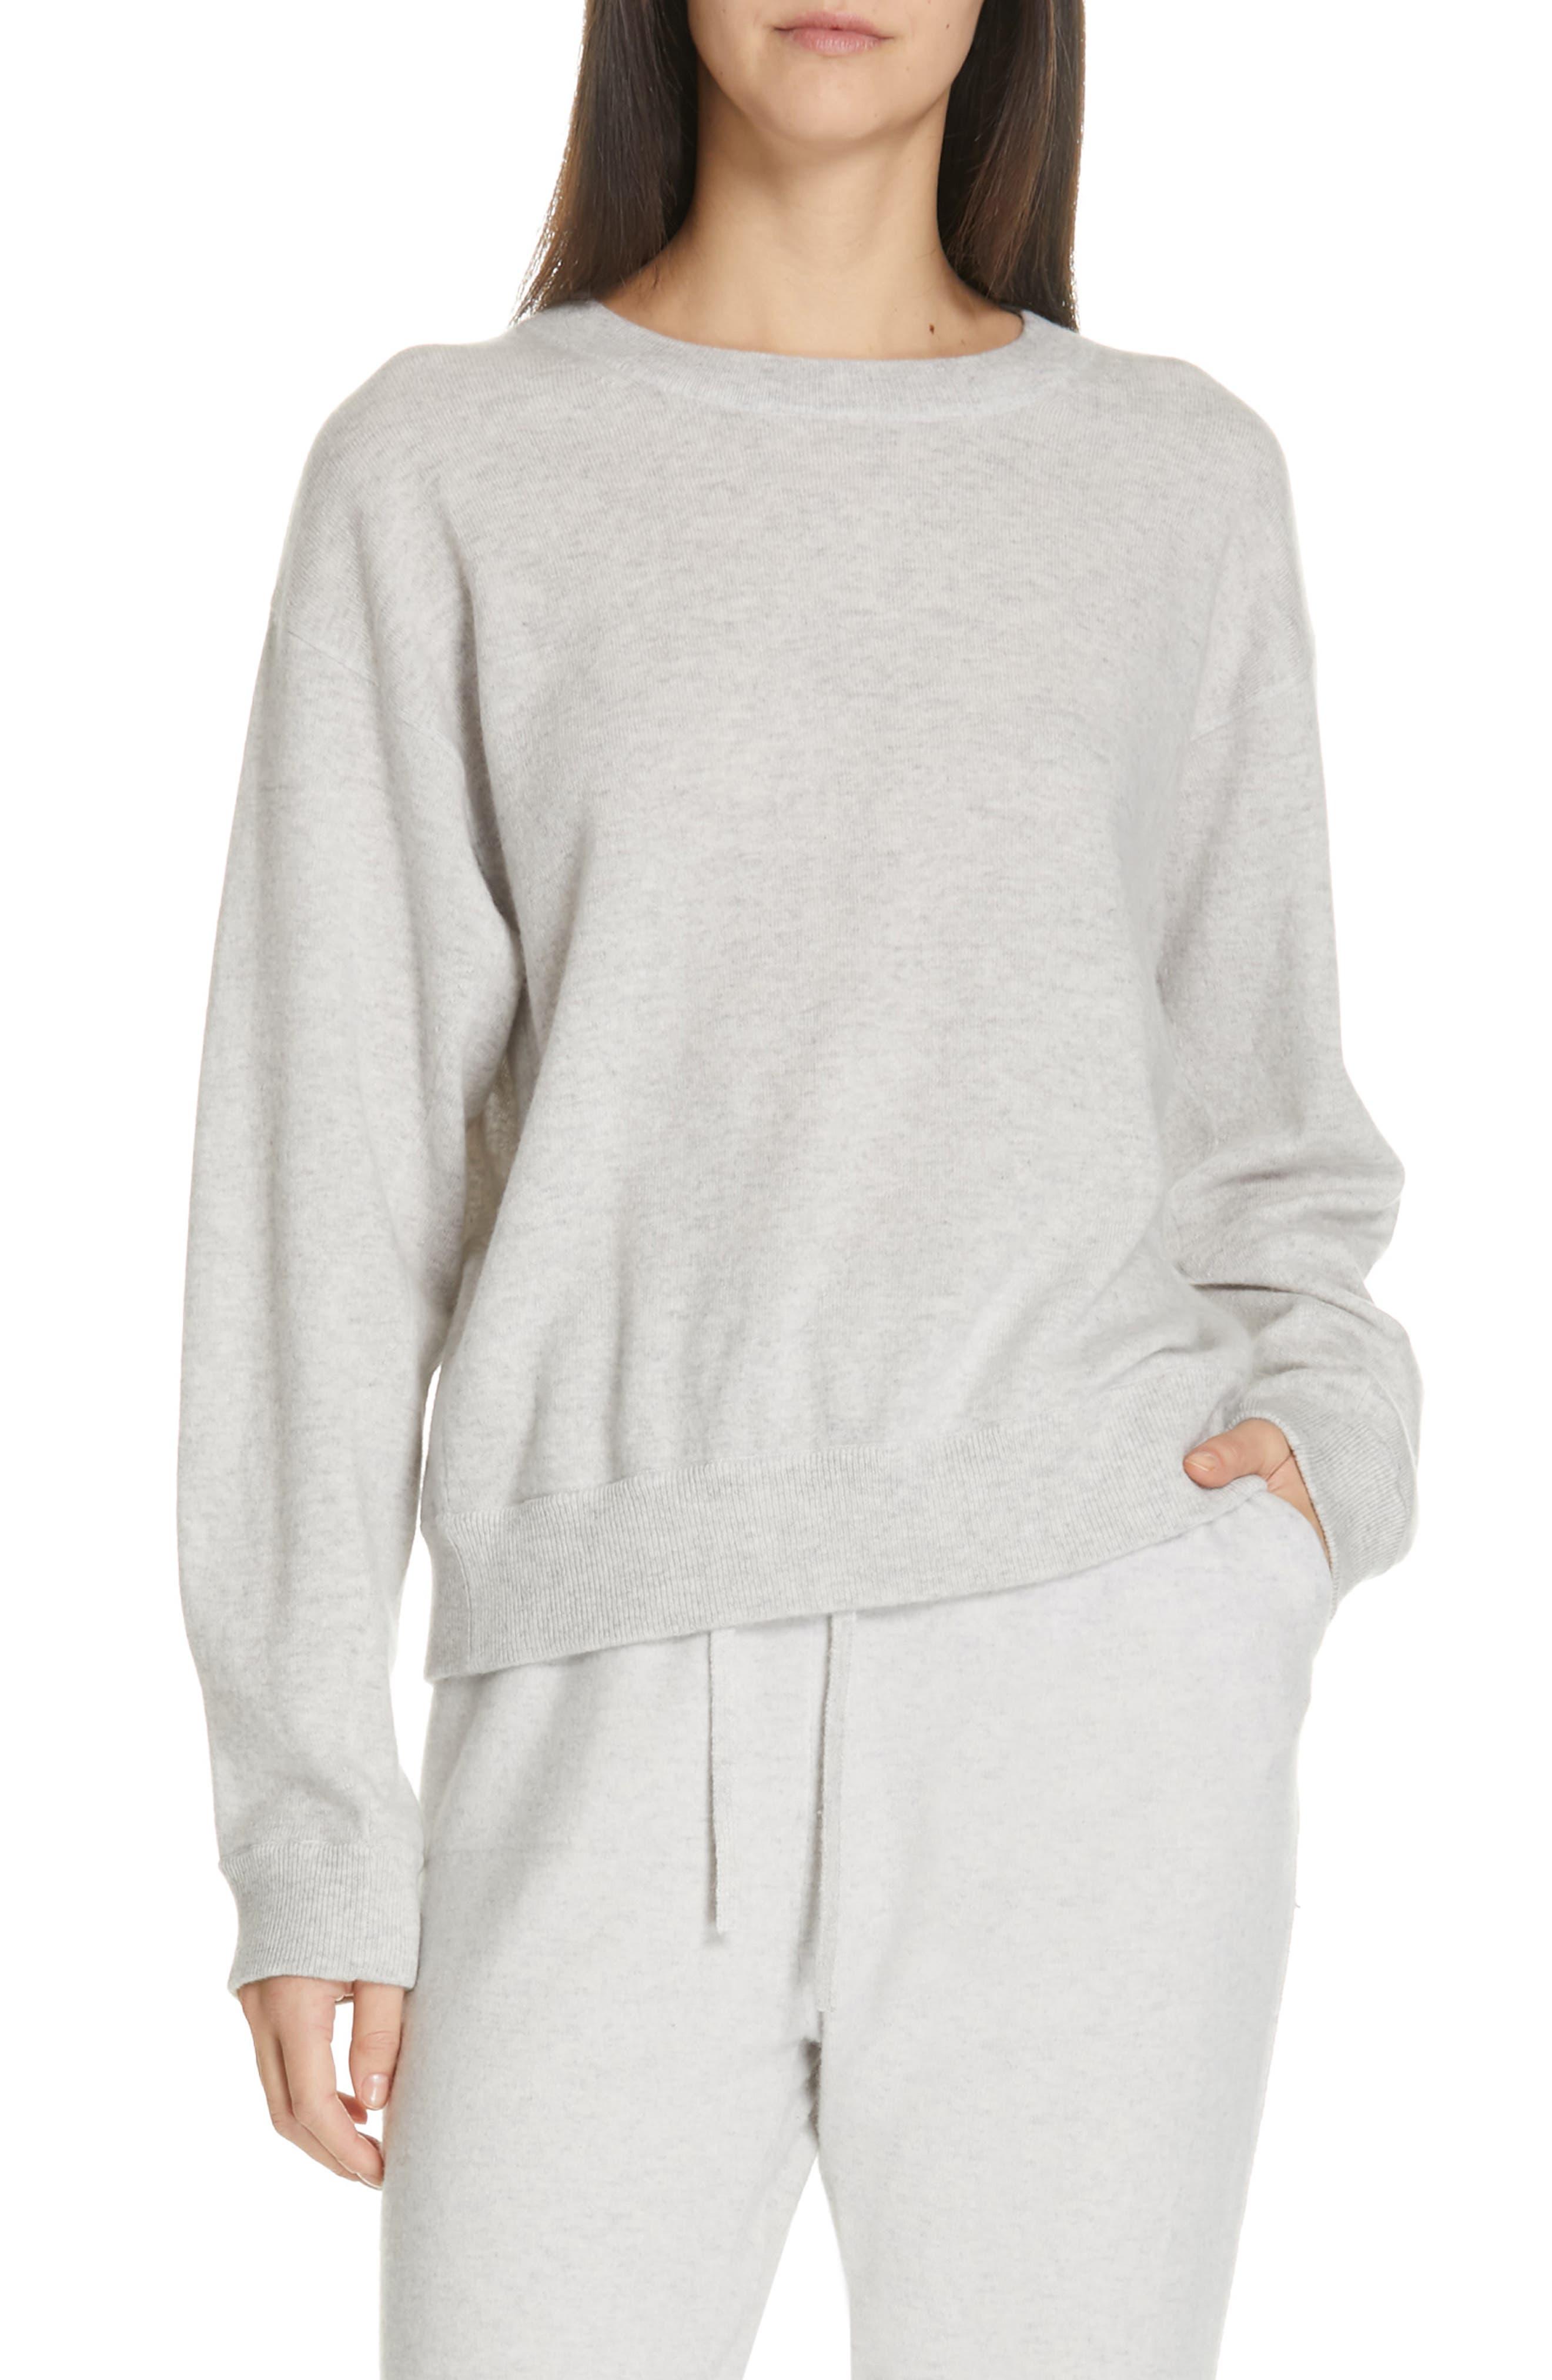 Boxy Cashmere Sweater, Main, color, LIGHT HEATHER GREY